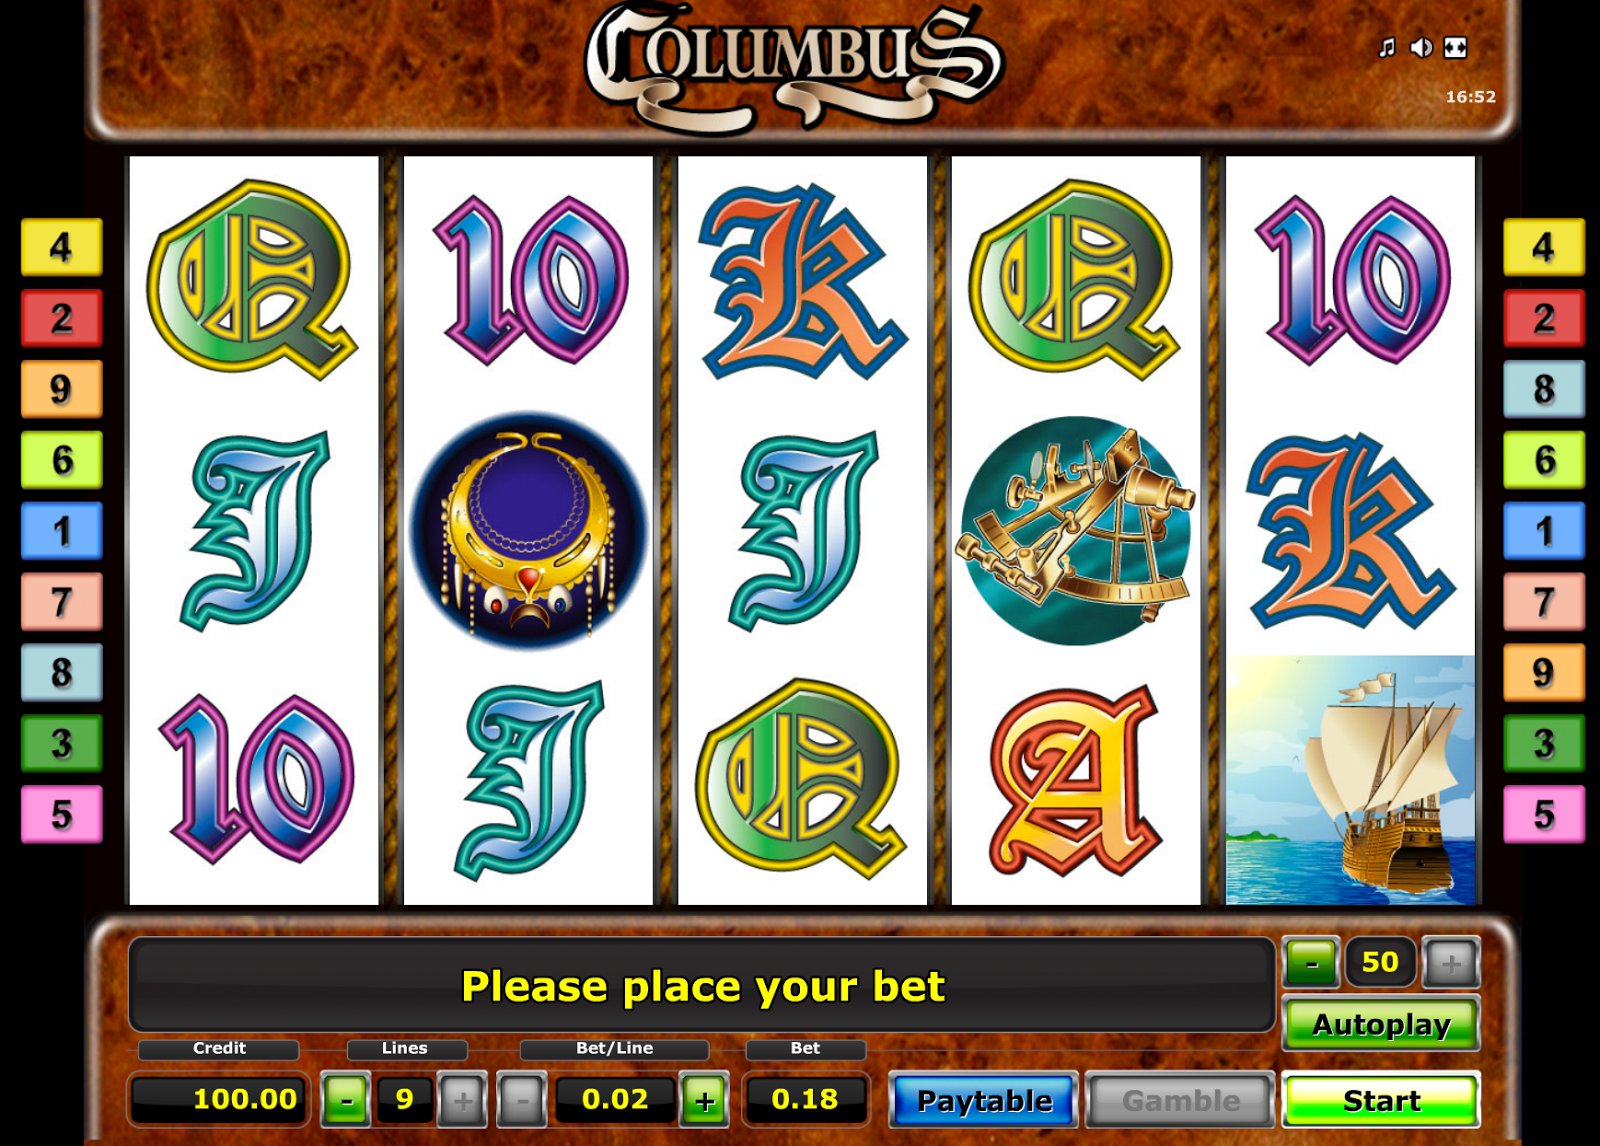 онлайн казино игровой автомат колумб lang ru